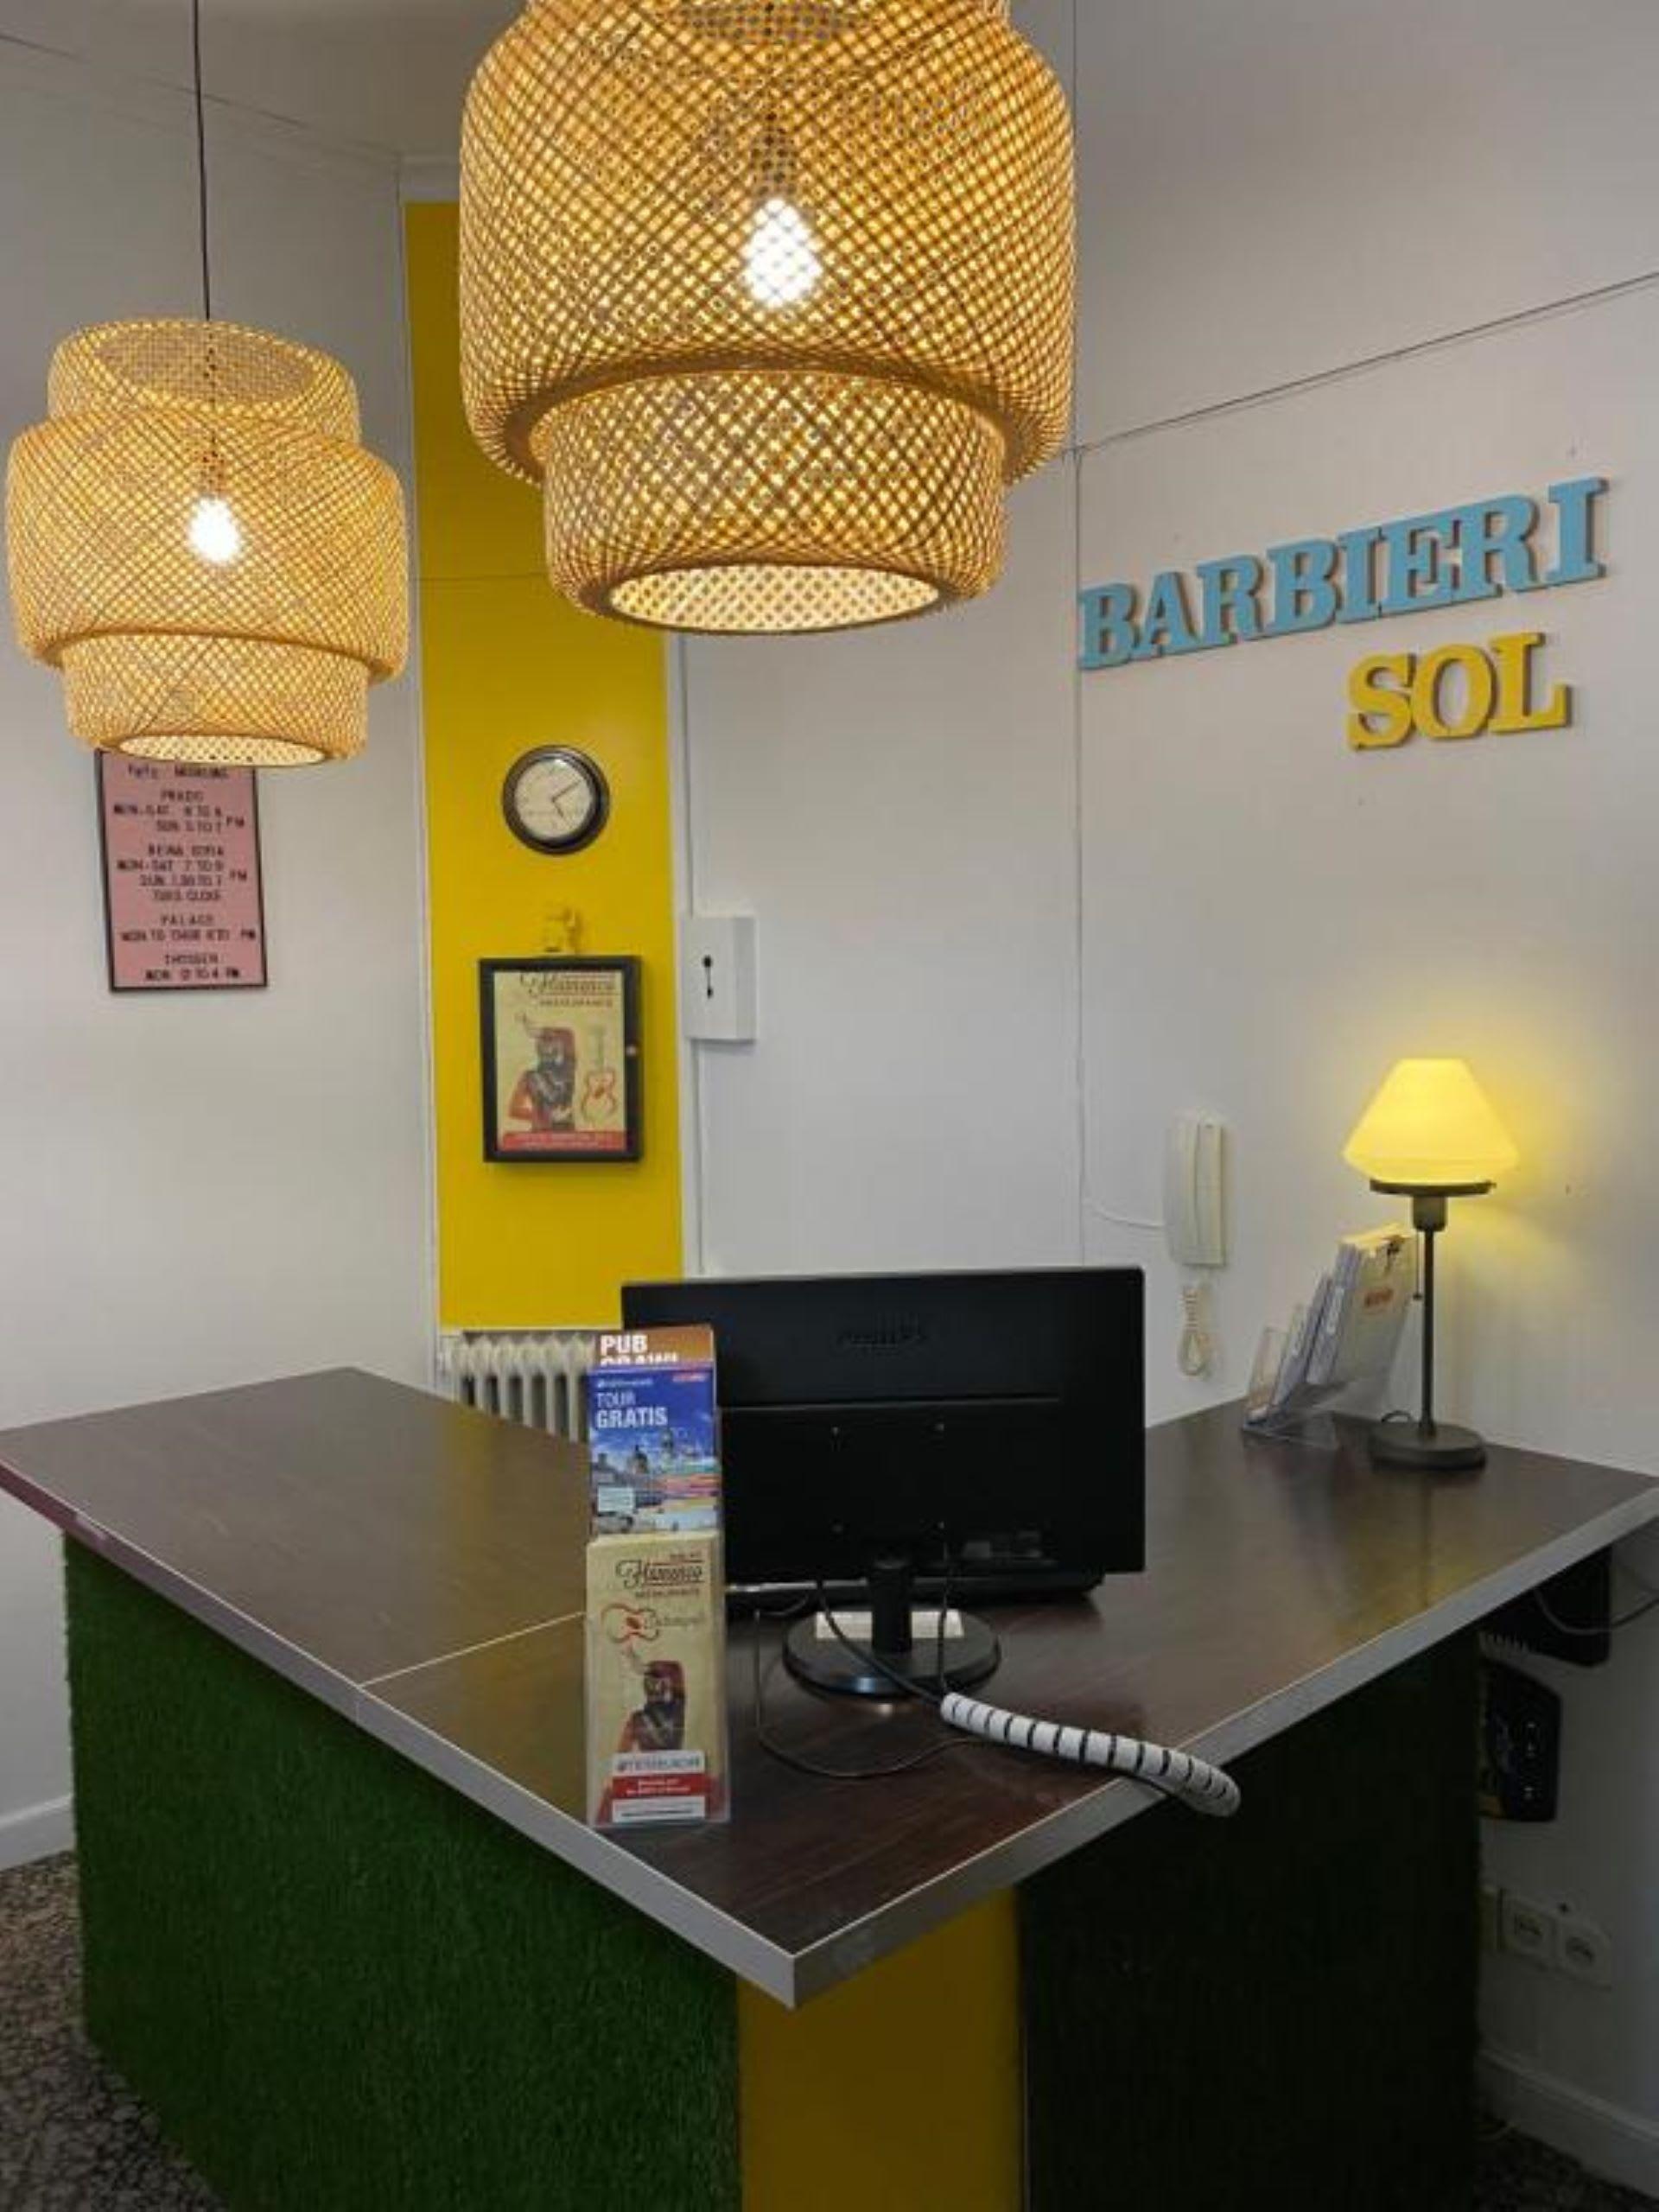 Barbieri Sol Hostel